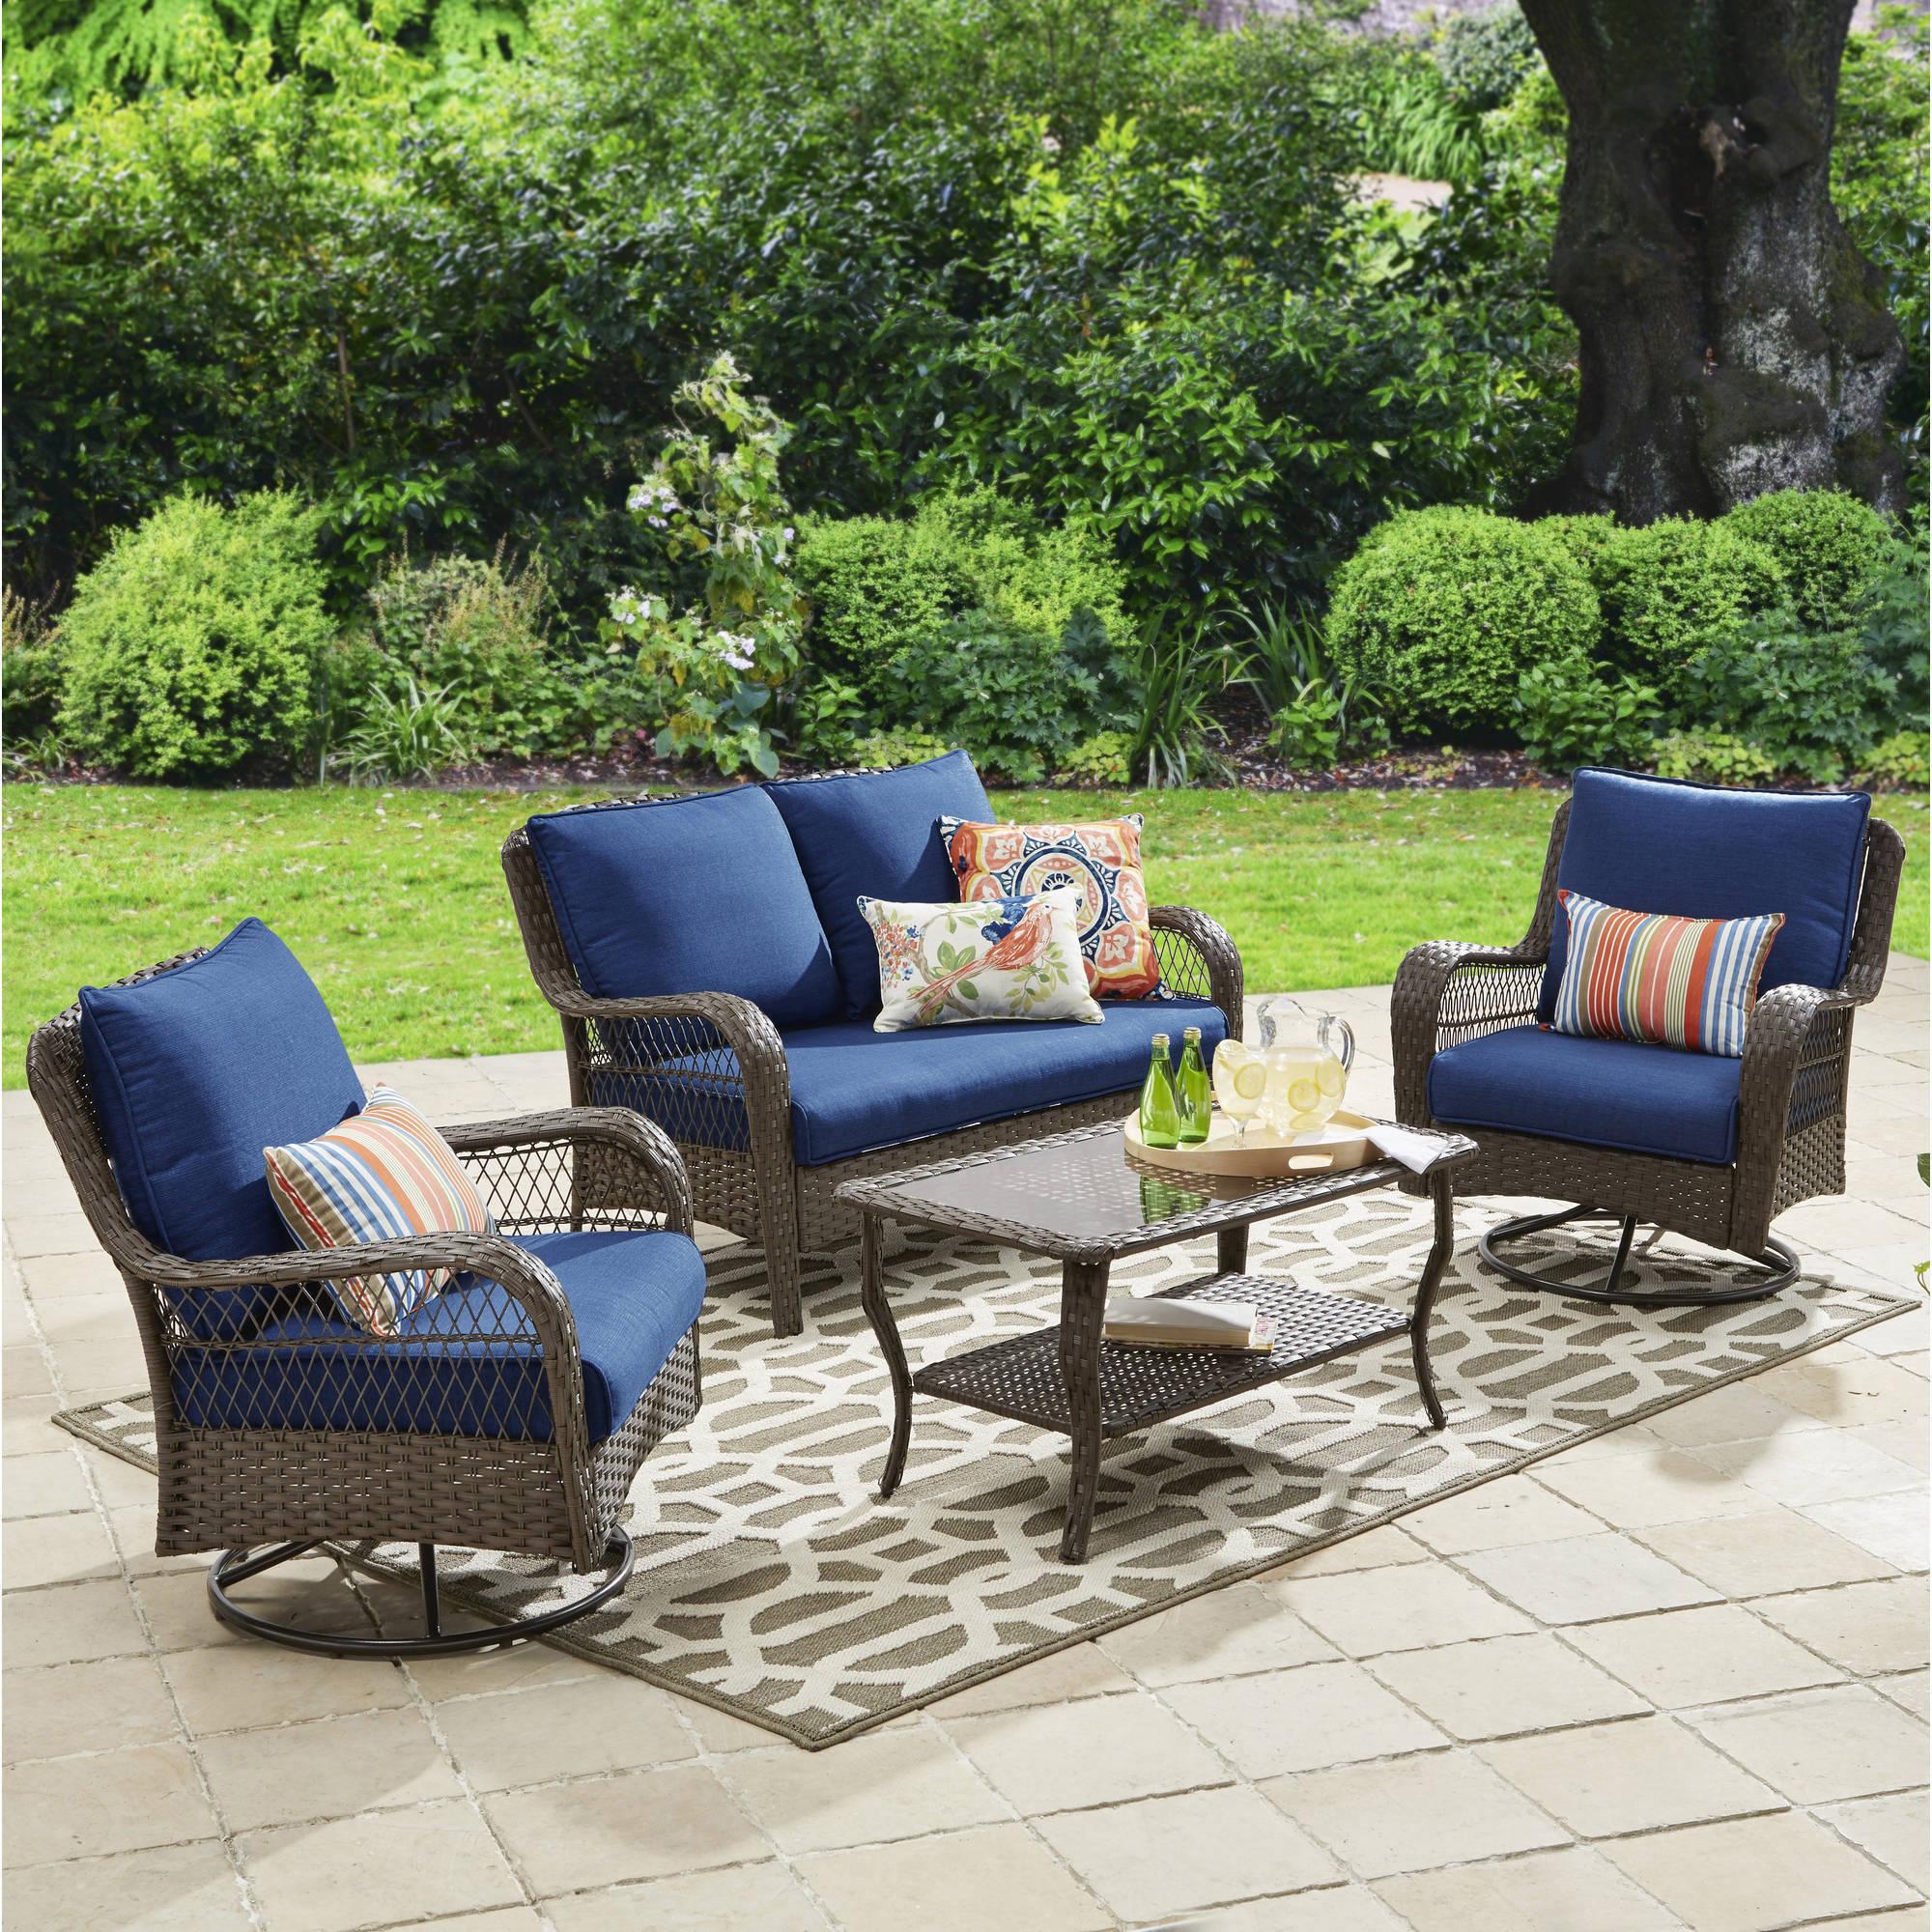 patio furniture sets better homes and gardens colebrook 4 piece outdoor conversation set - KPSJGXR